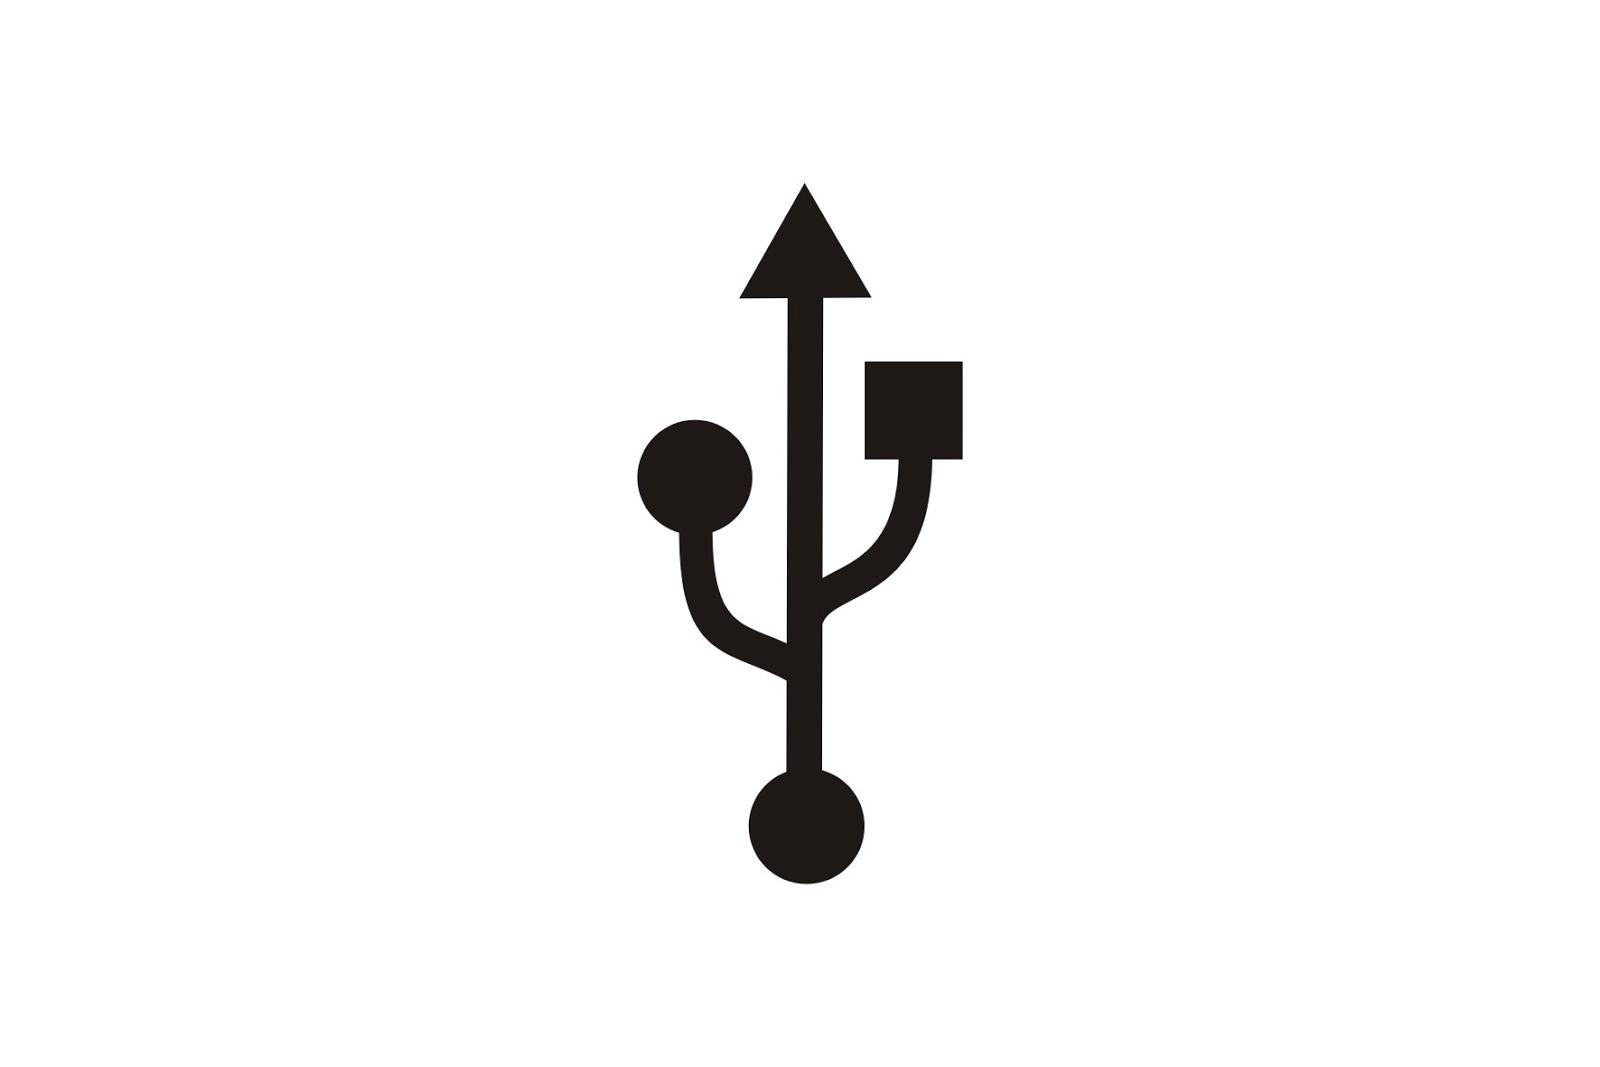 usb logo logoshare